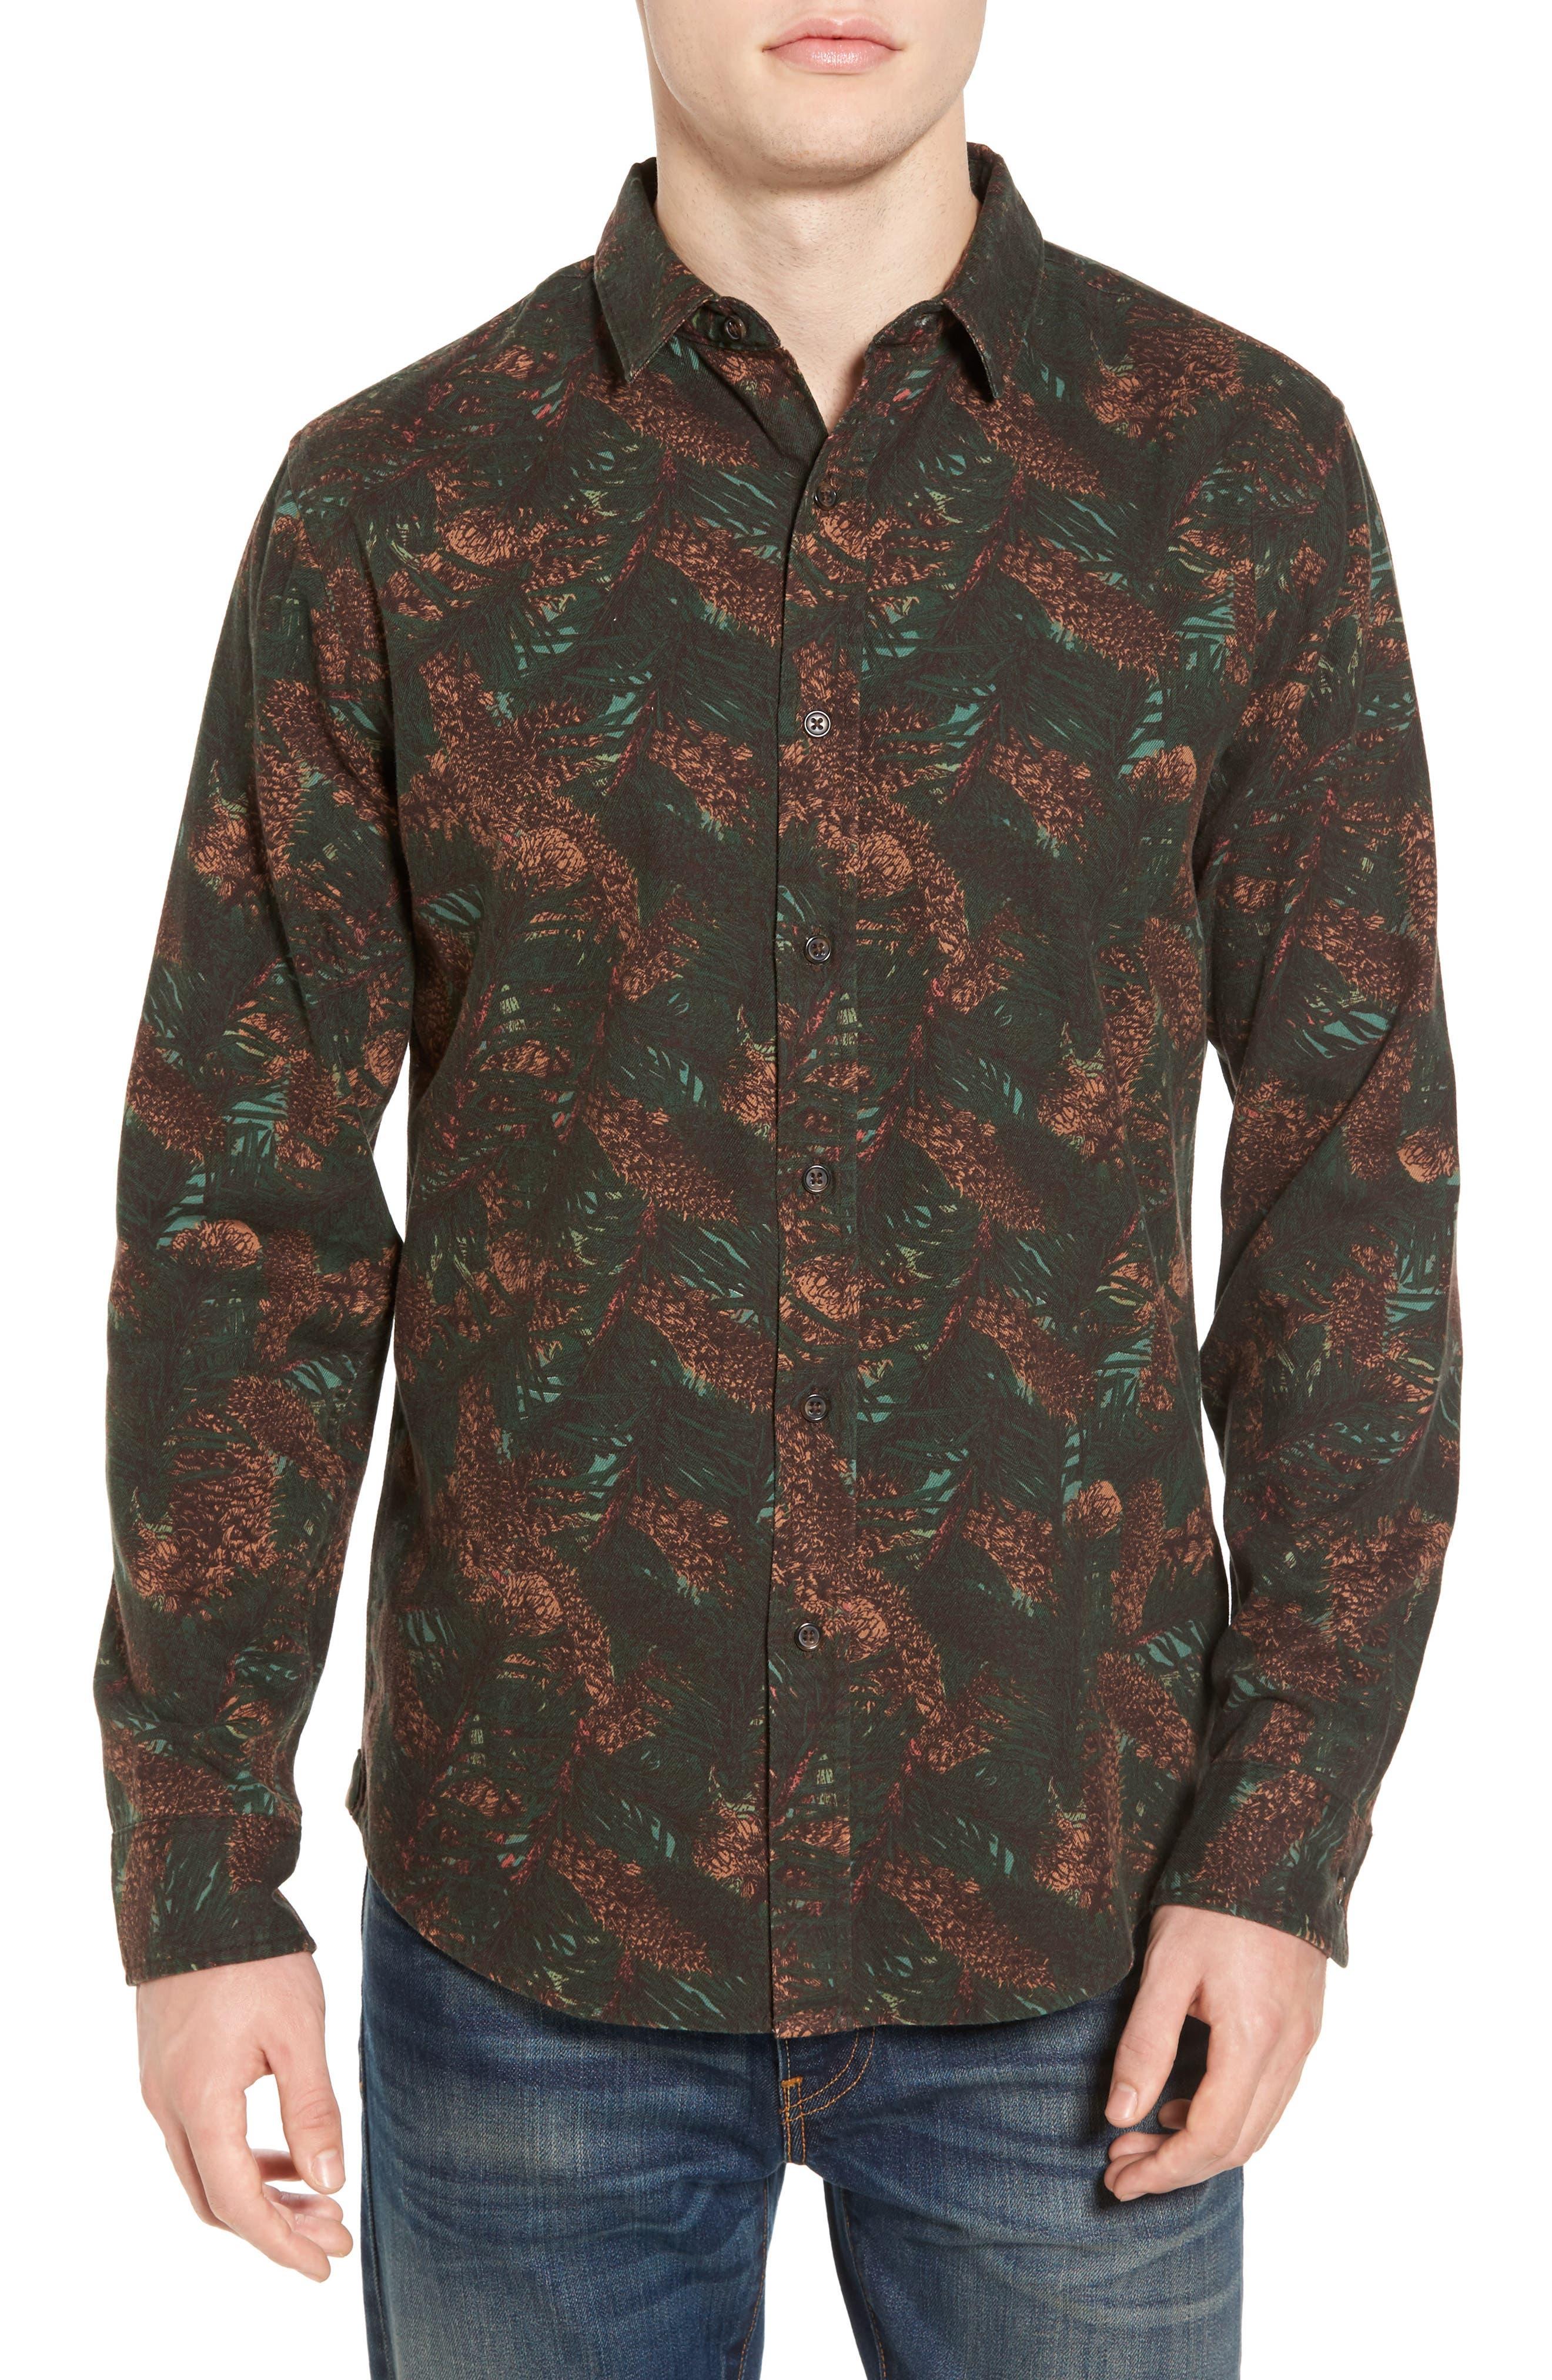 Main Image - 1901 Print Flannel Shirt